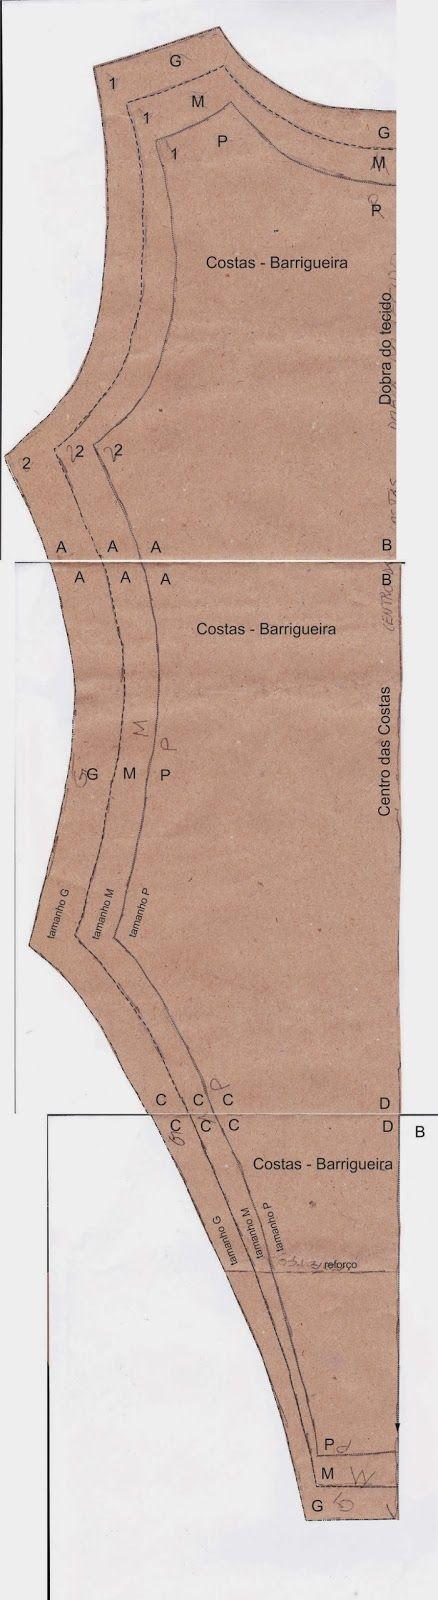 Molde+Barrigueira+-+geral+Costas.jpg 438×1,600 pixeles